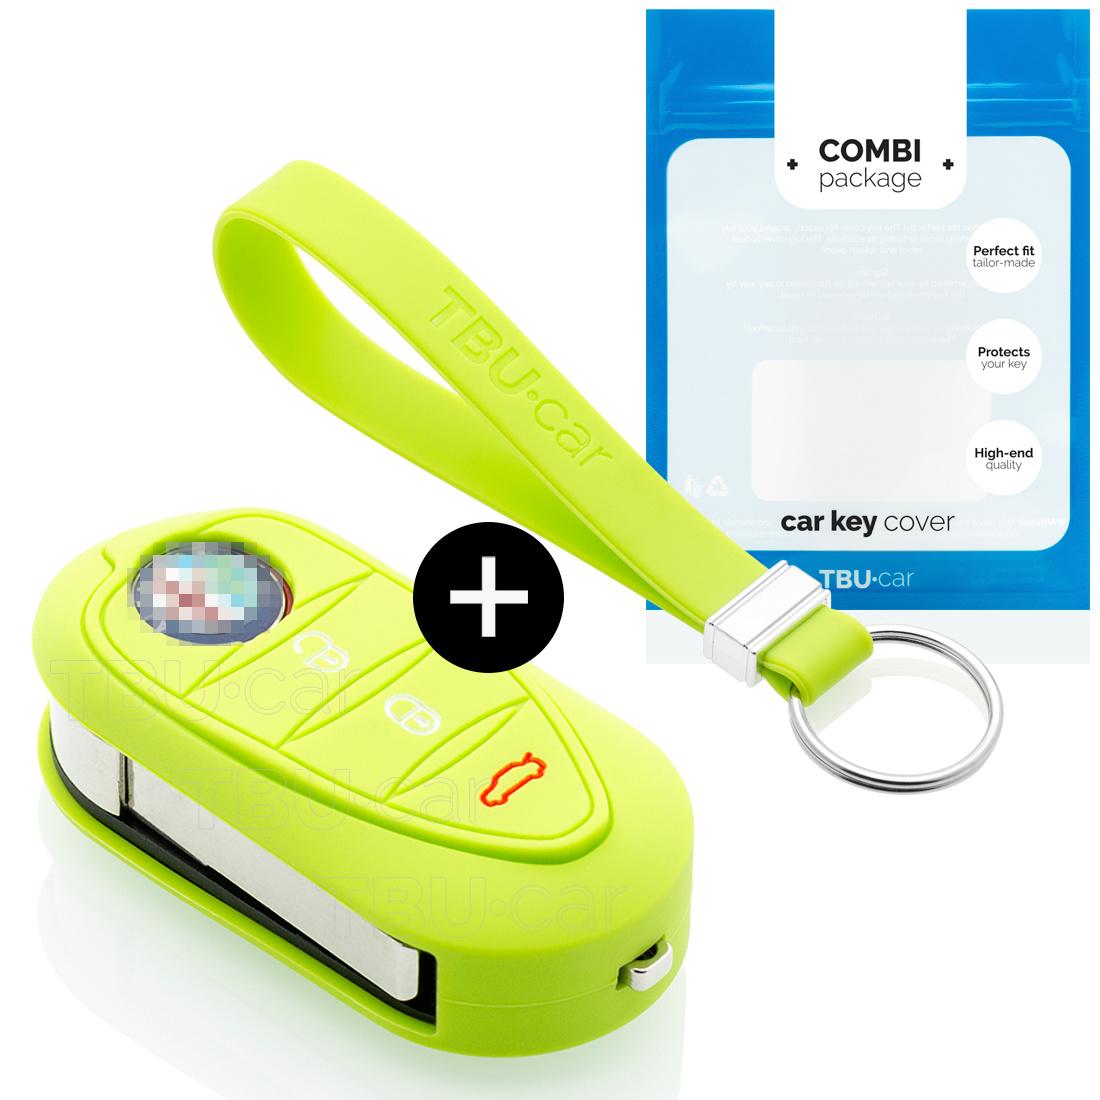 TBU car TBU car Car key cover compatible with Alfa Romeo - Silicone Protective Remote Key Shell - FOB Case Cover - Lime green